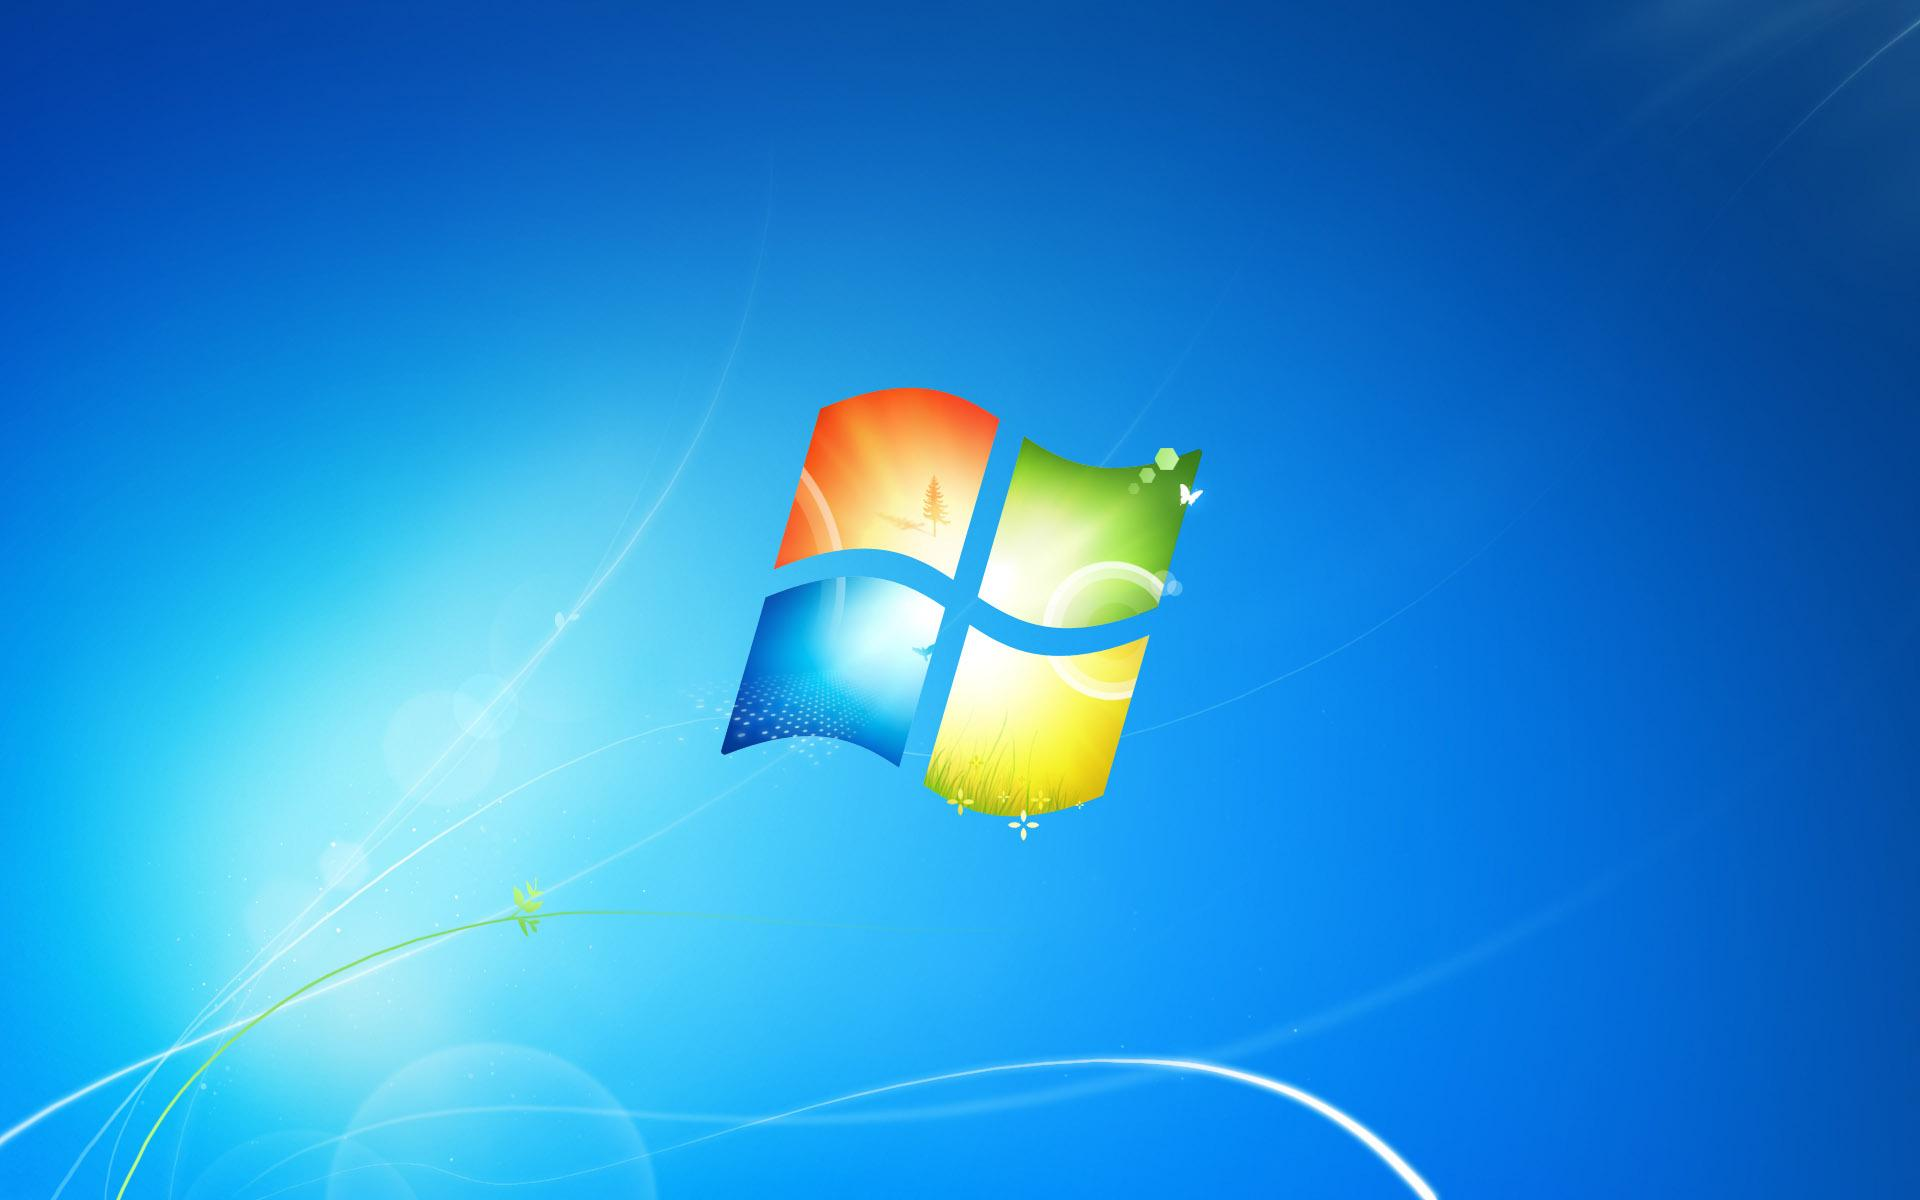 Название windows 7 размер 1920x1200